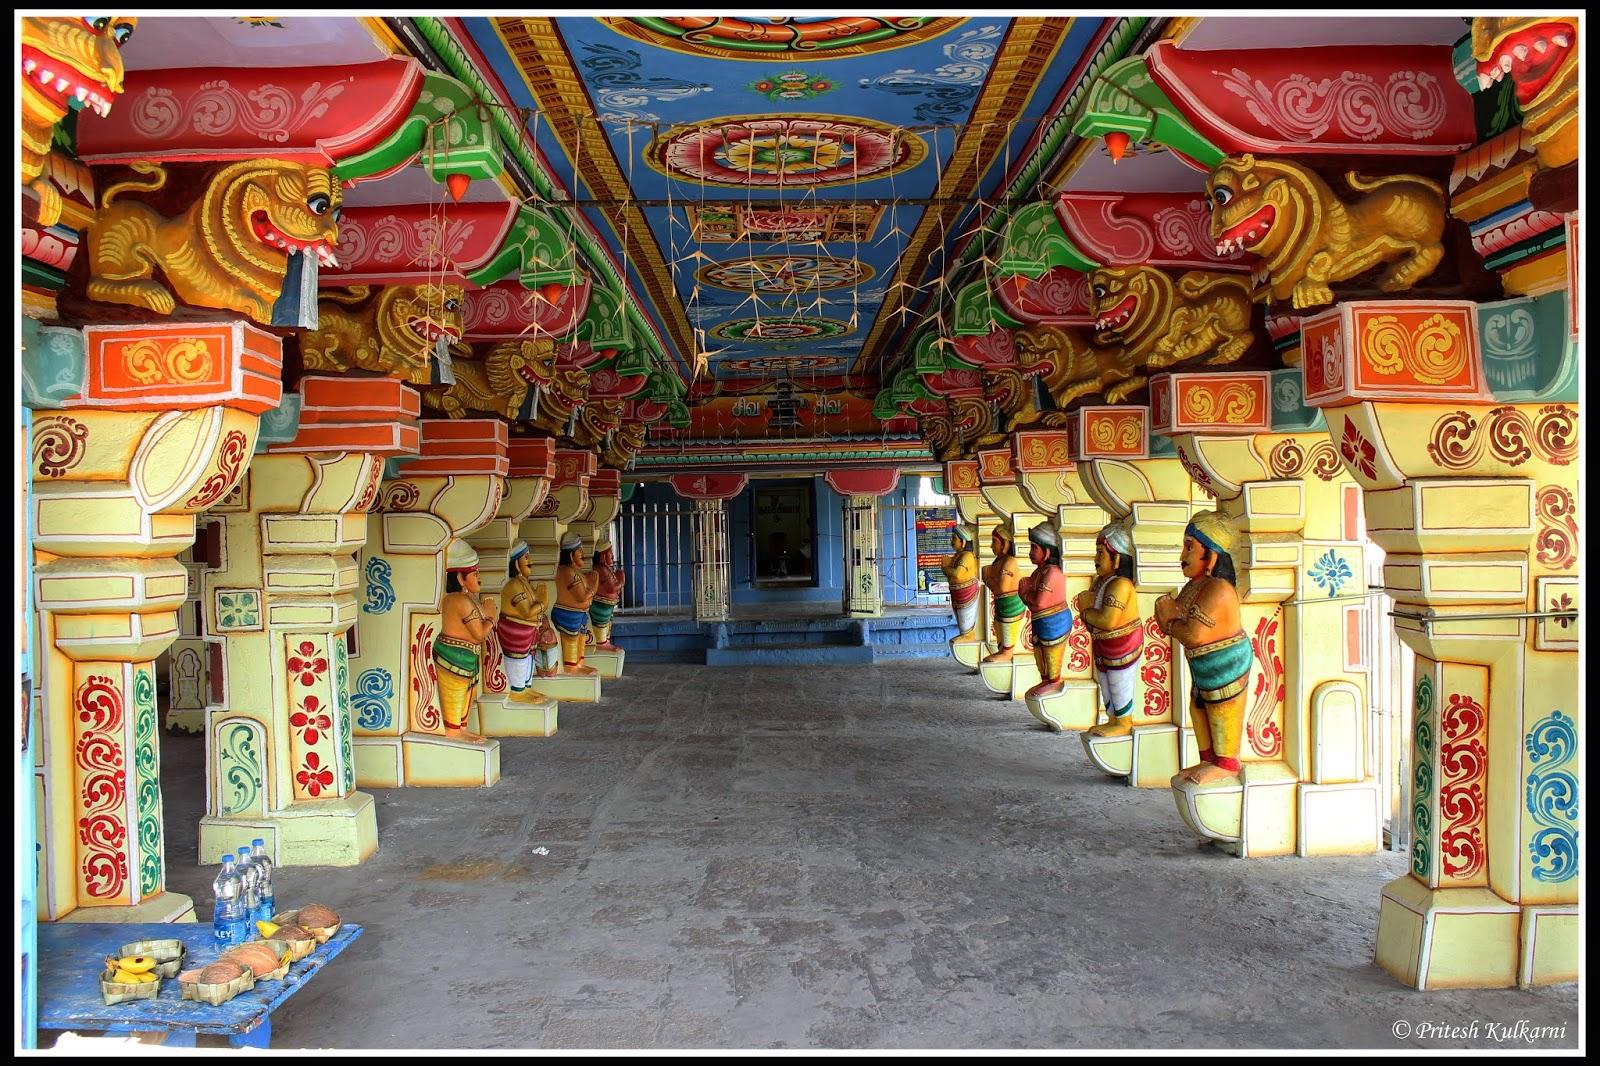 Ram Tirtham